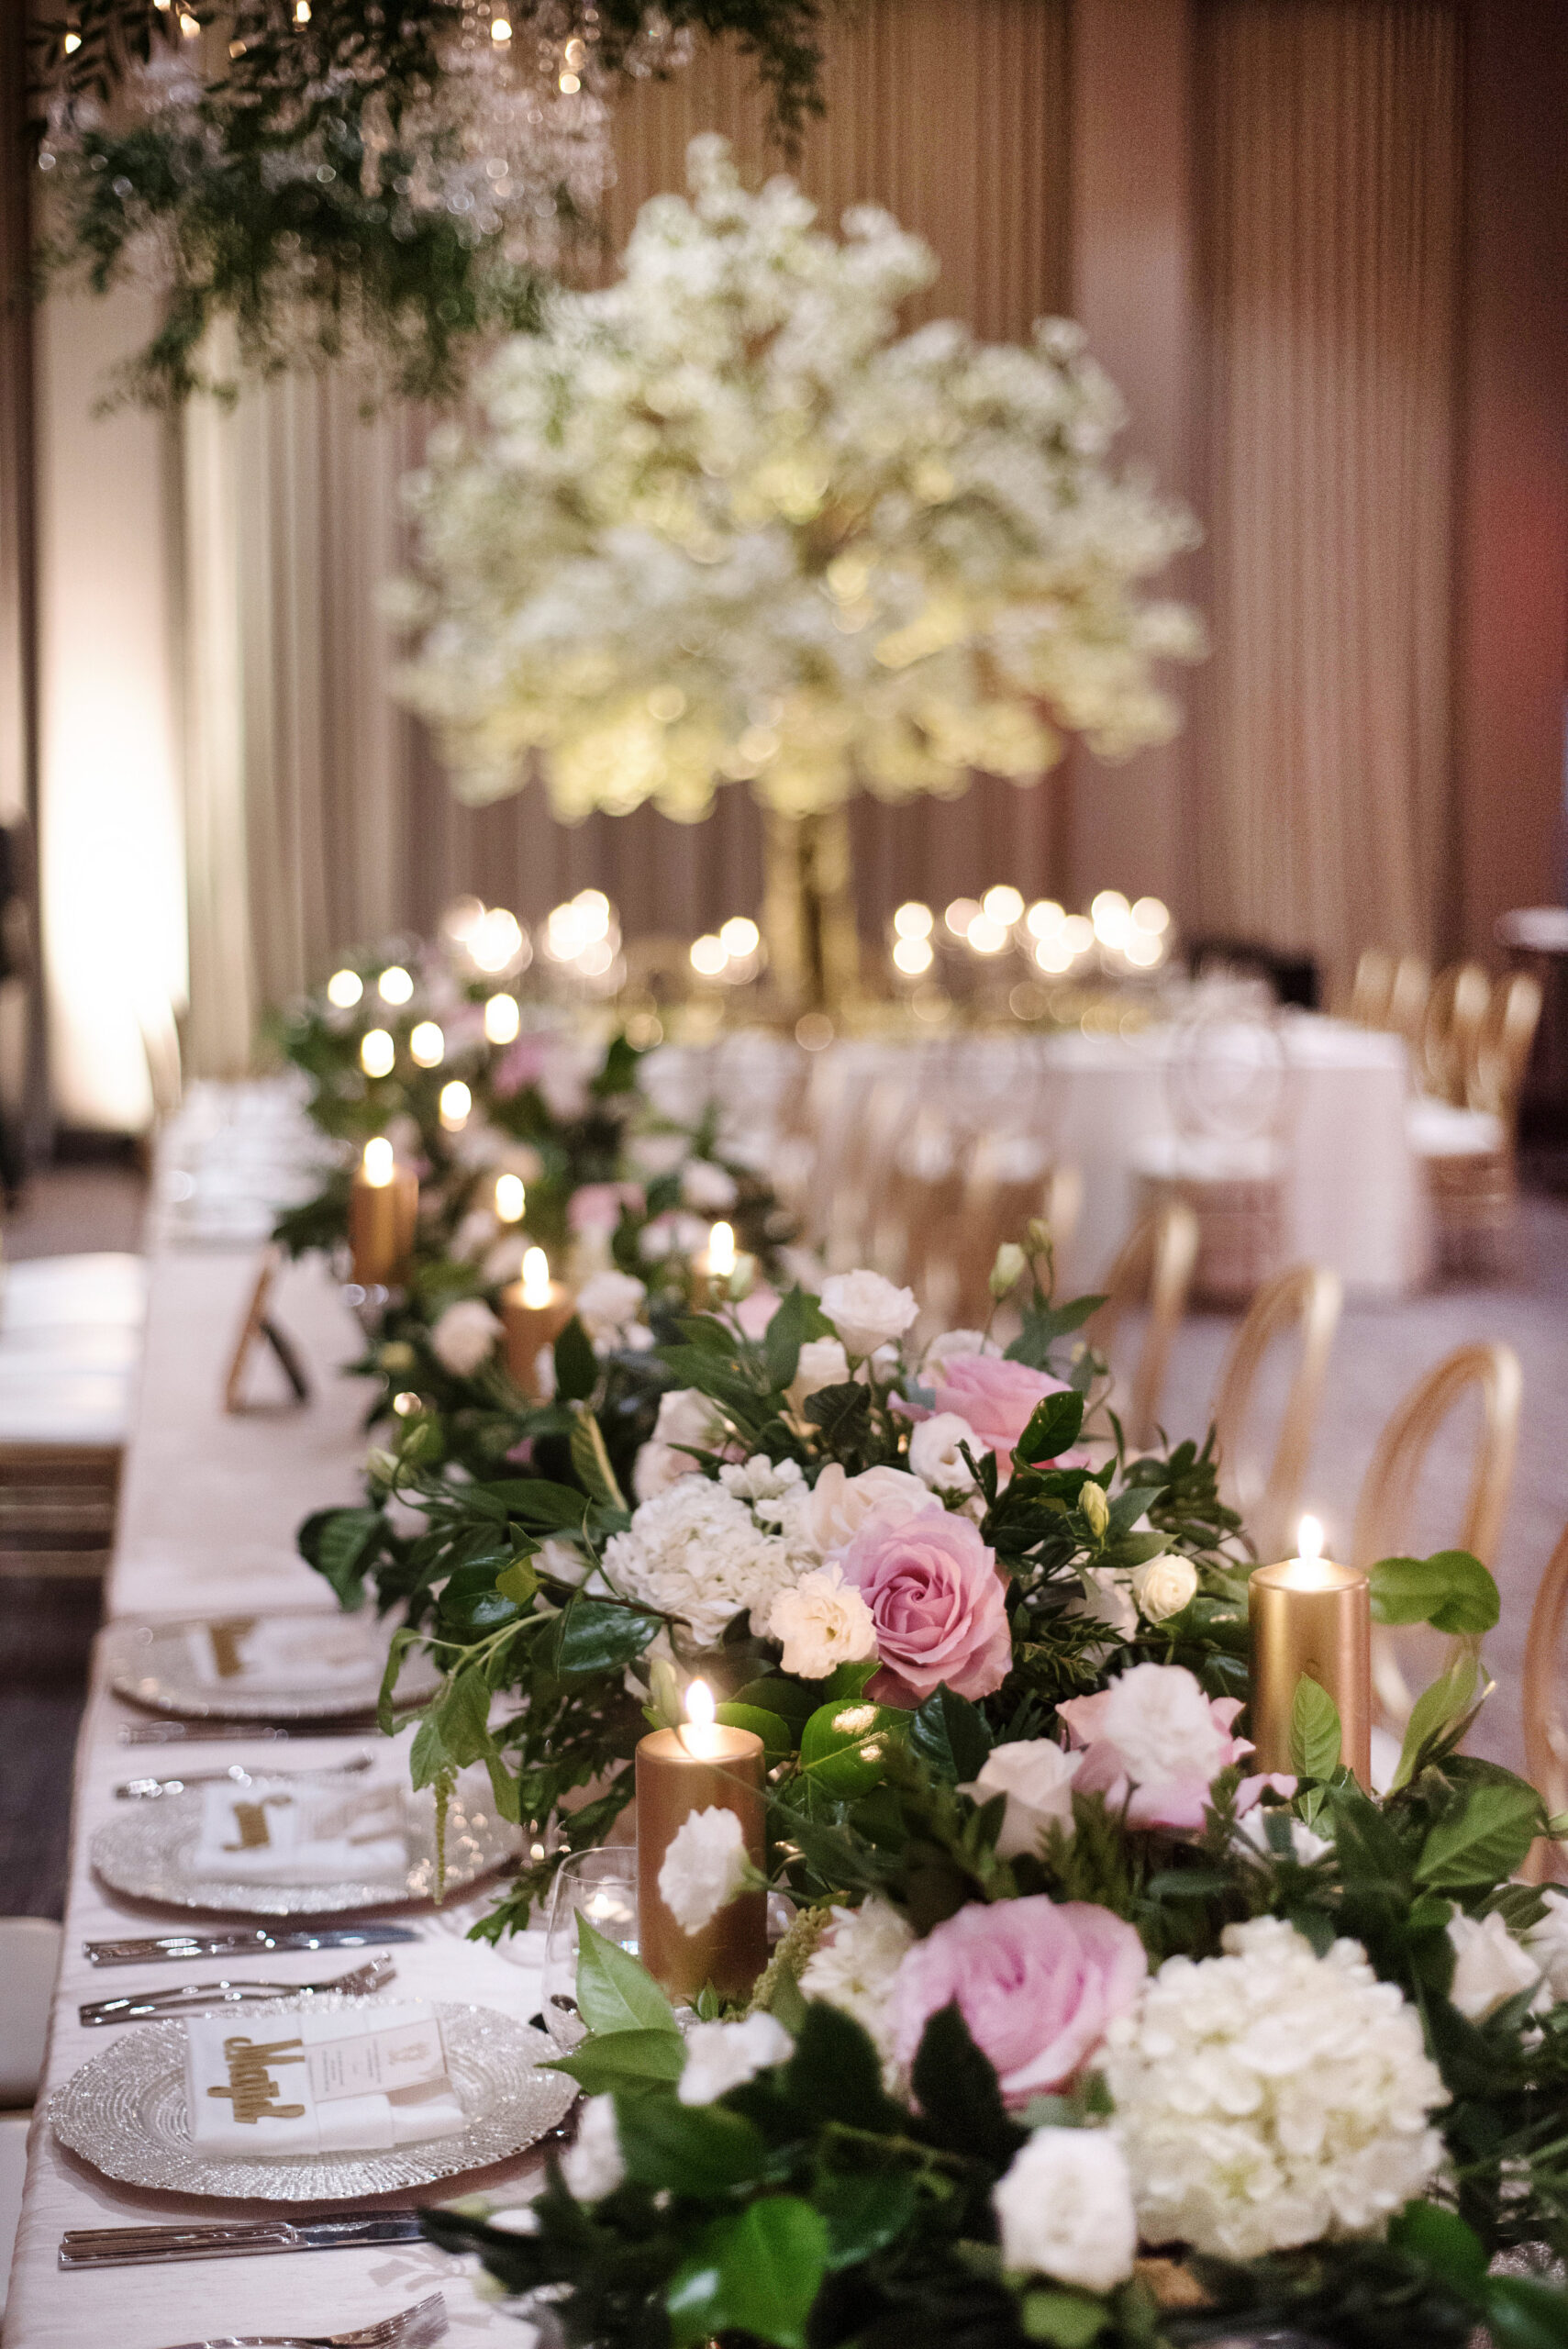 https://secureservercdn.net/45.40.145.151/kgq.ab5.myftpupload.com/wp-content/uploads/2020/04/Sanam-Soroush-s-Wedding-wedluxe-submission-0091-scaled.jpg?time=1627956768